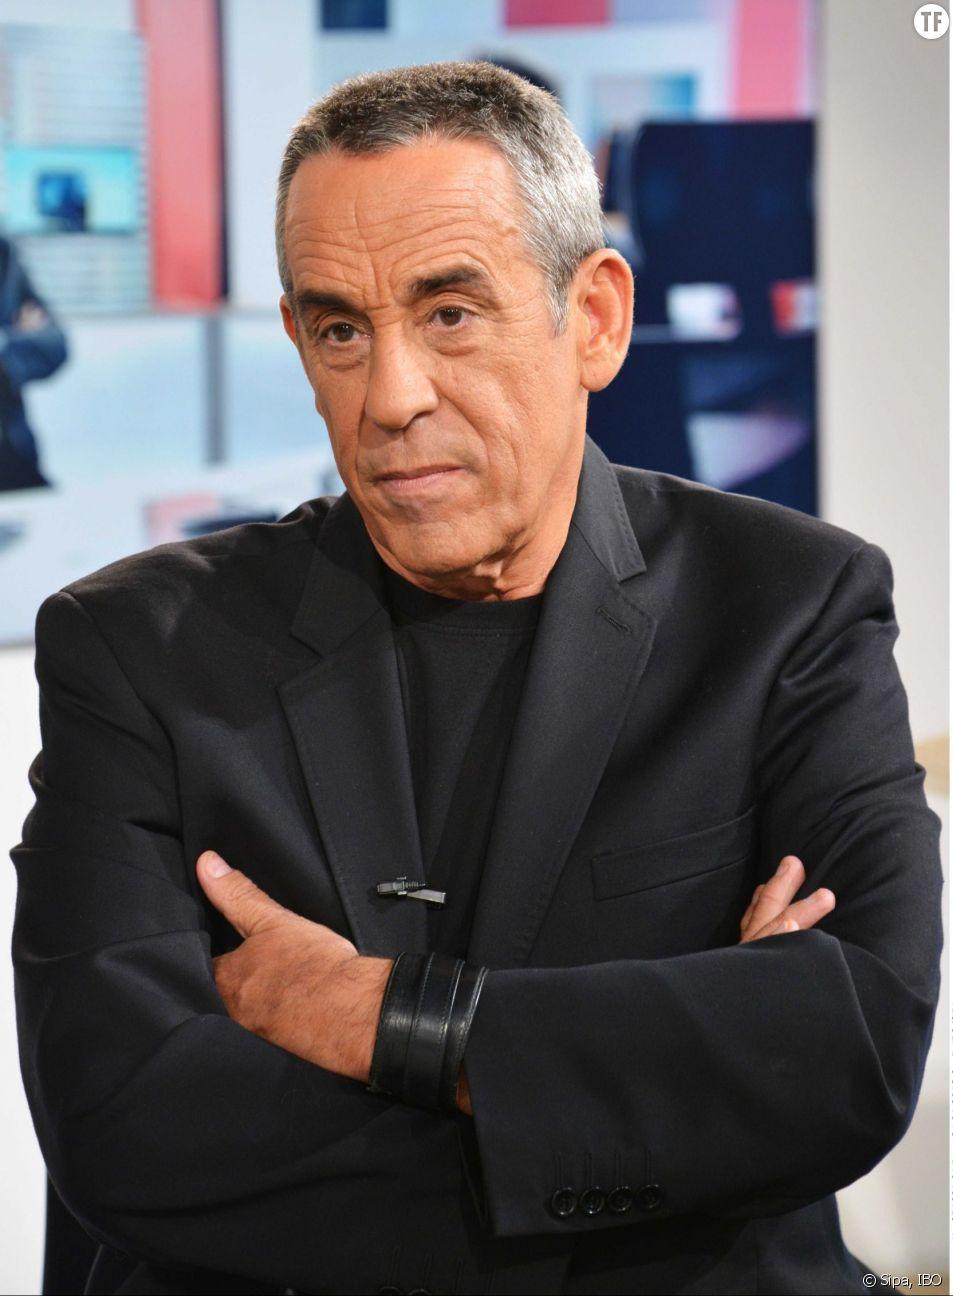 Thierry Ardisson